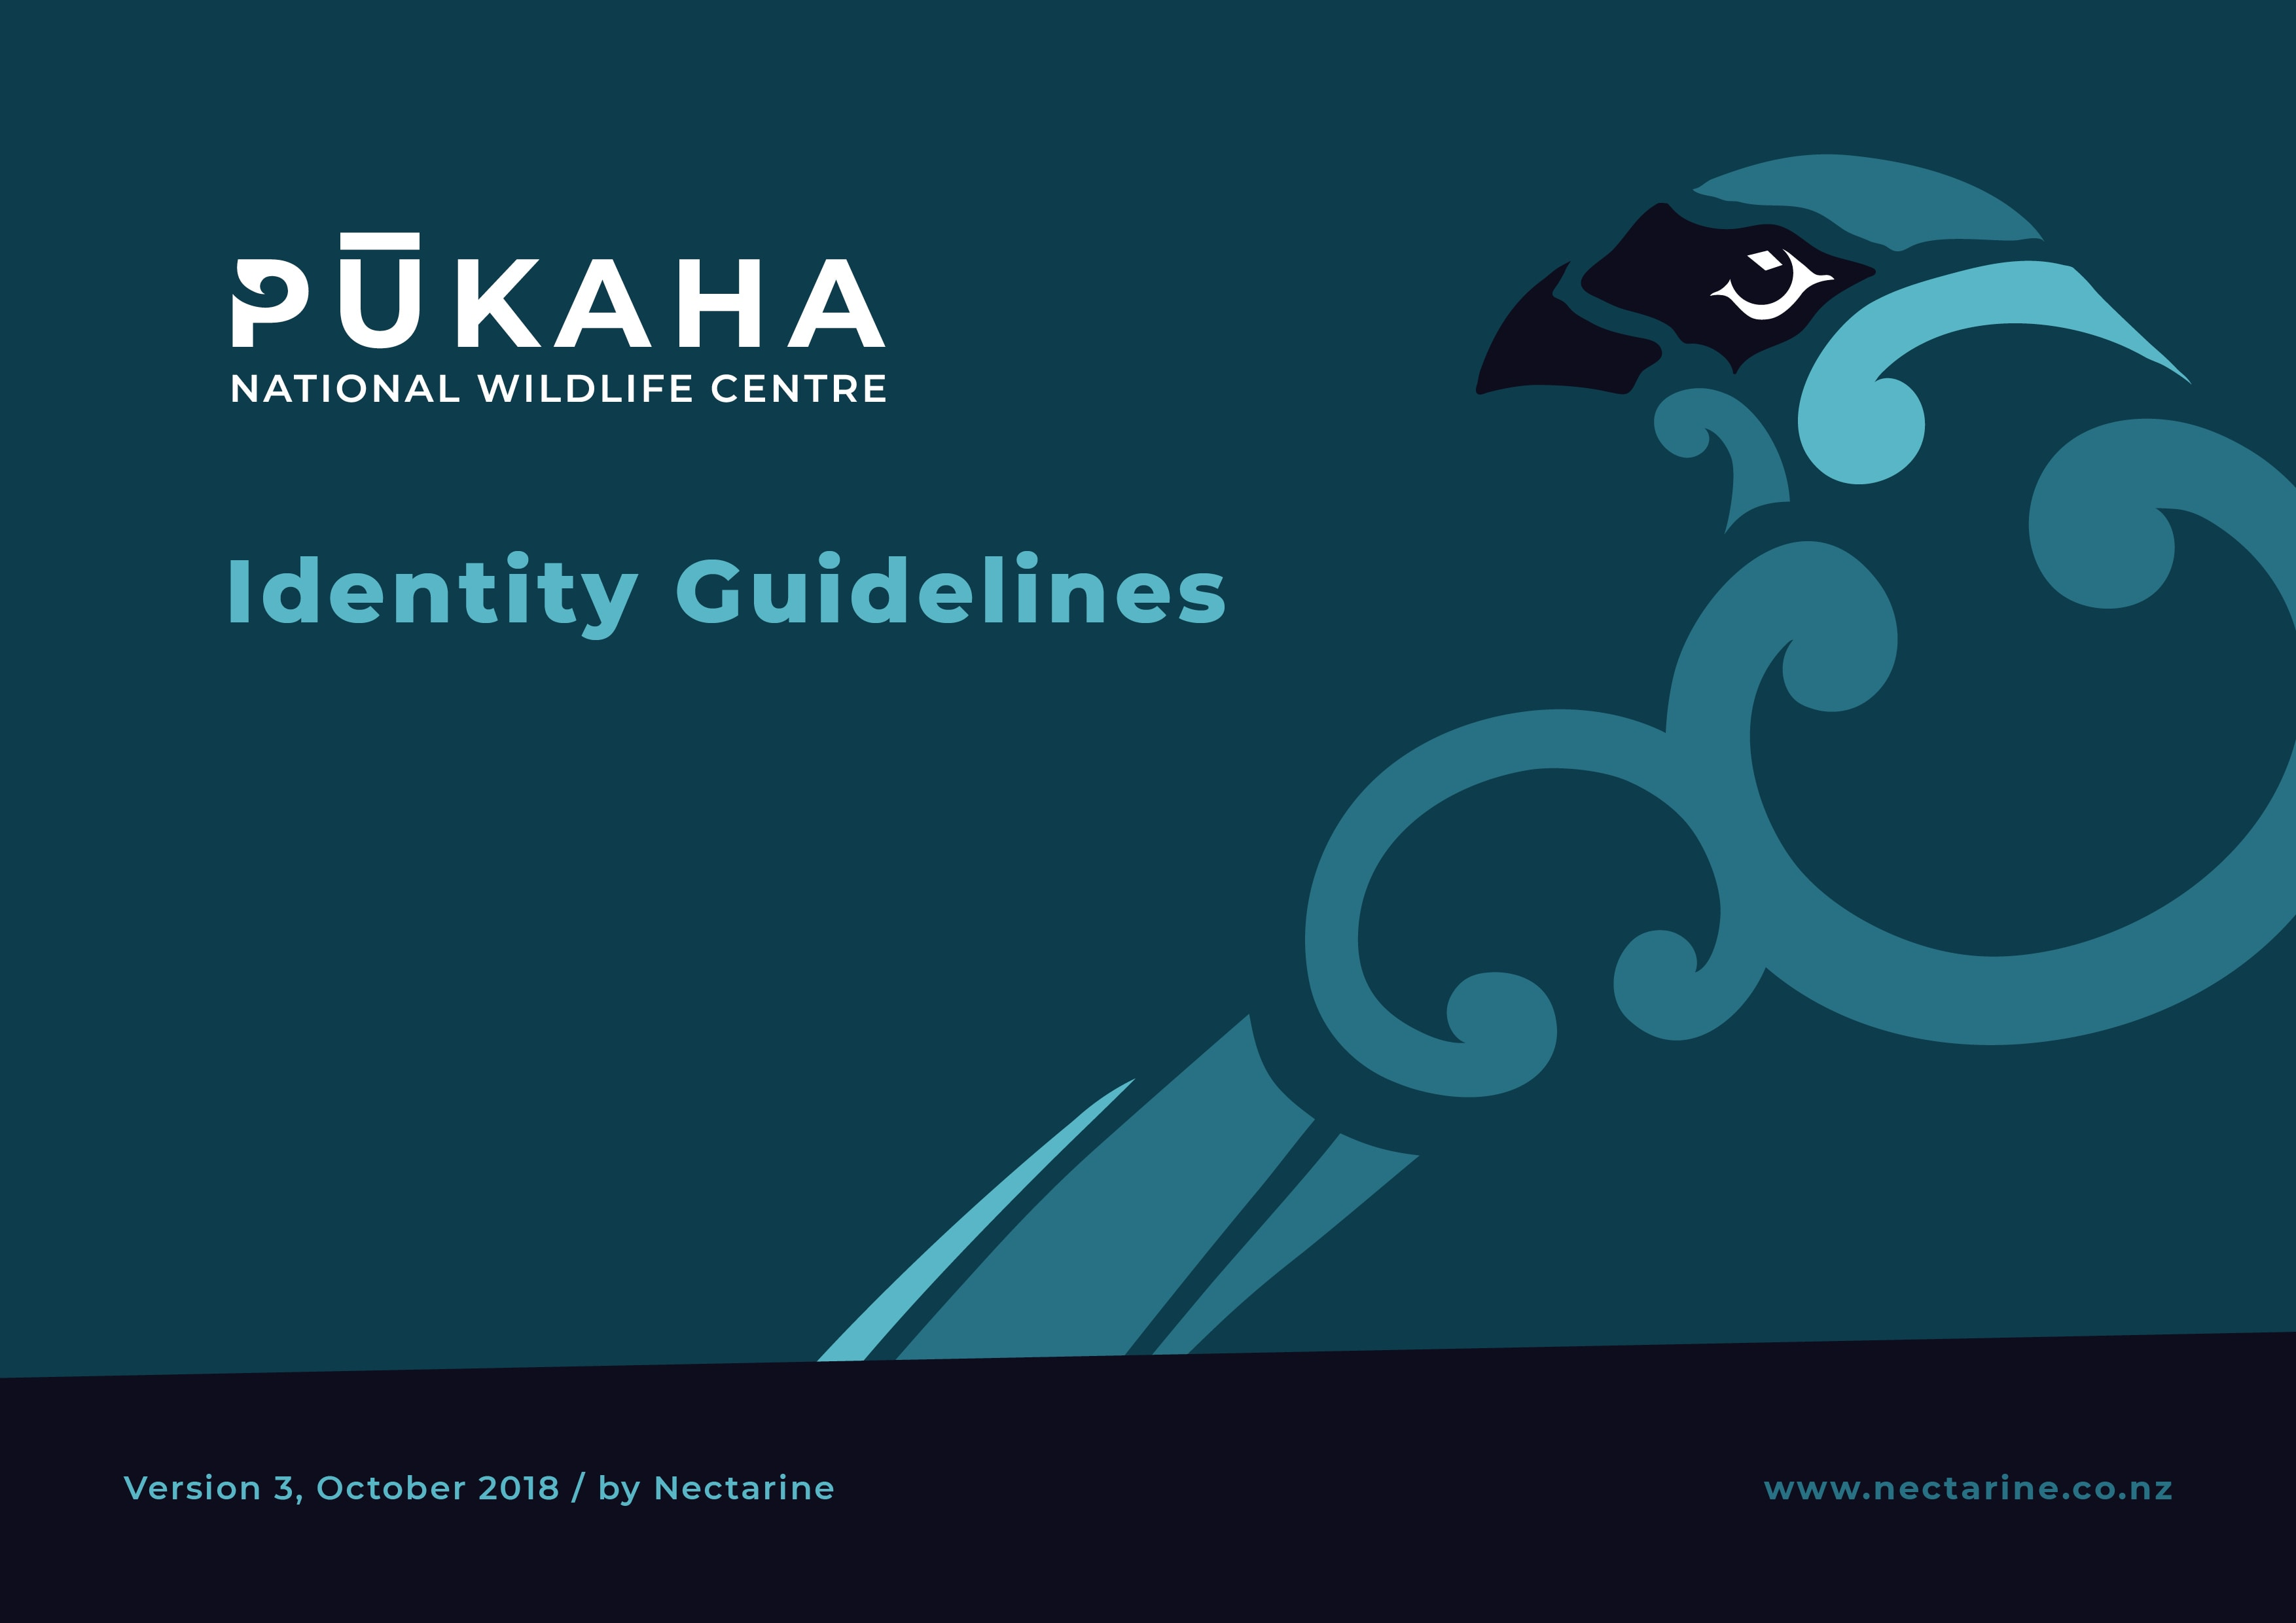 Pukaha Identity Guidelines